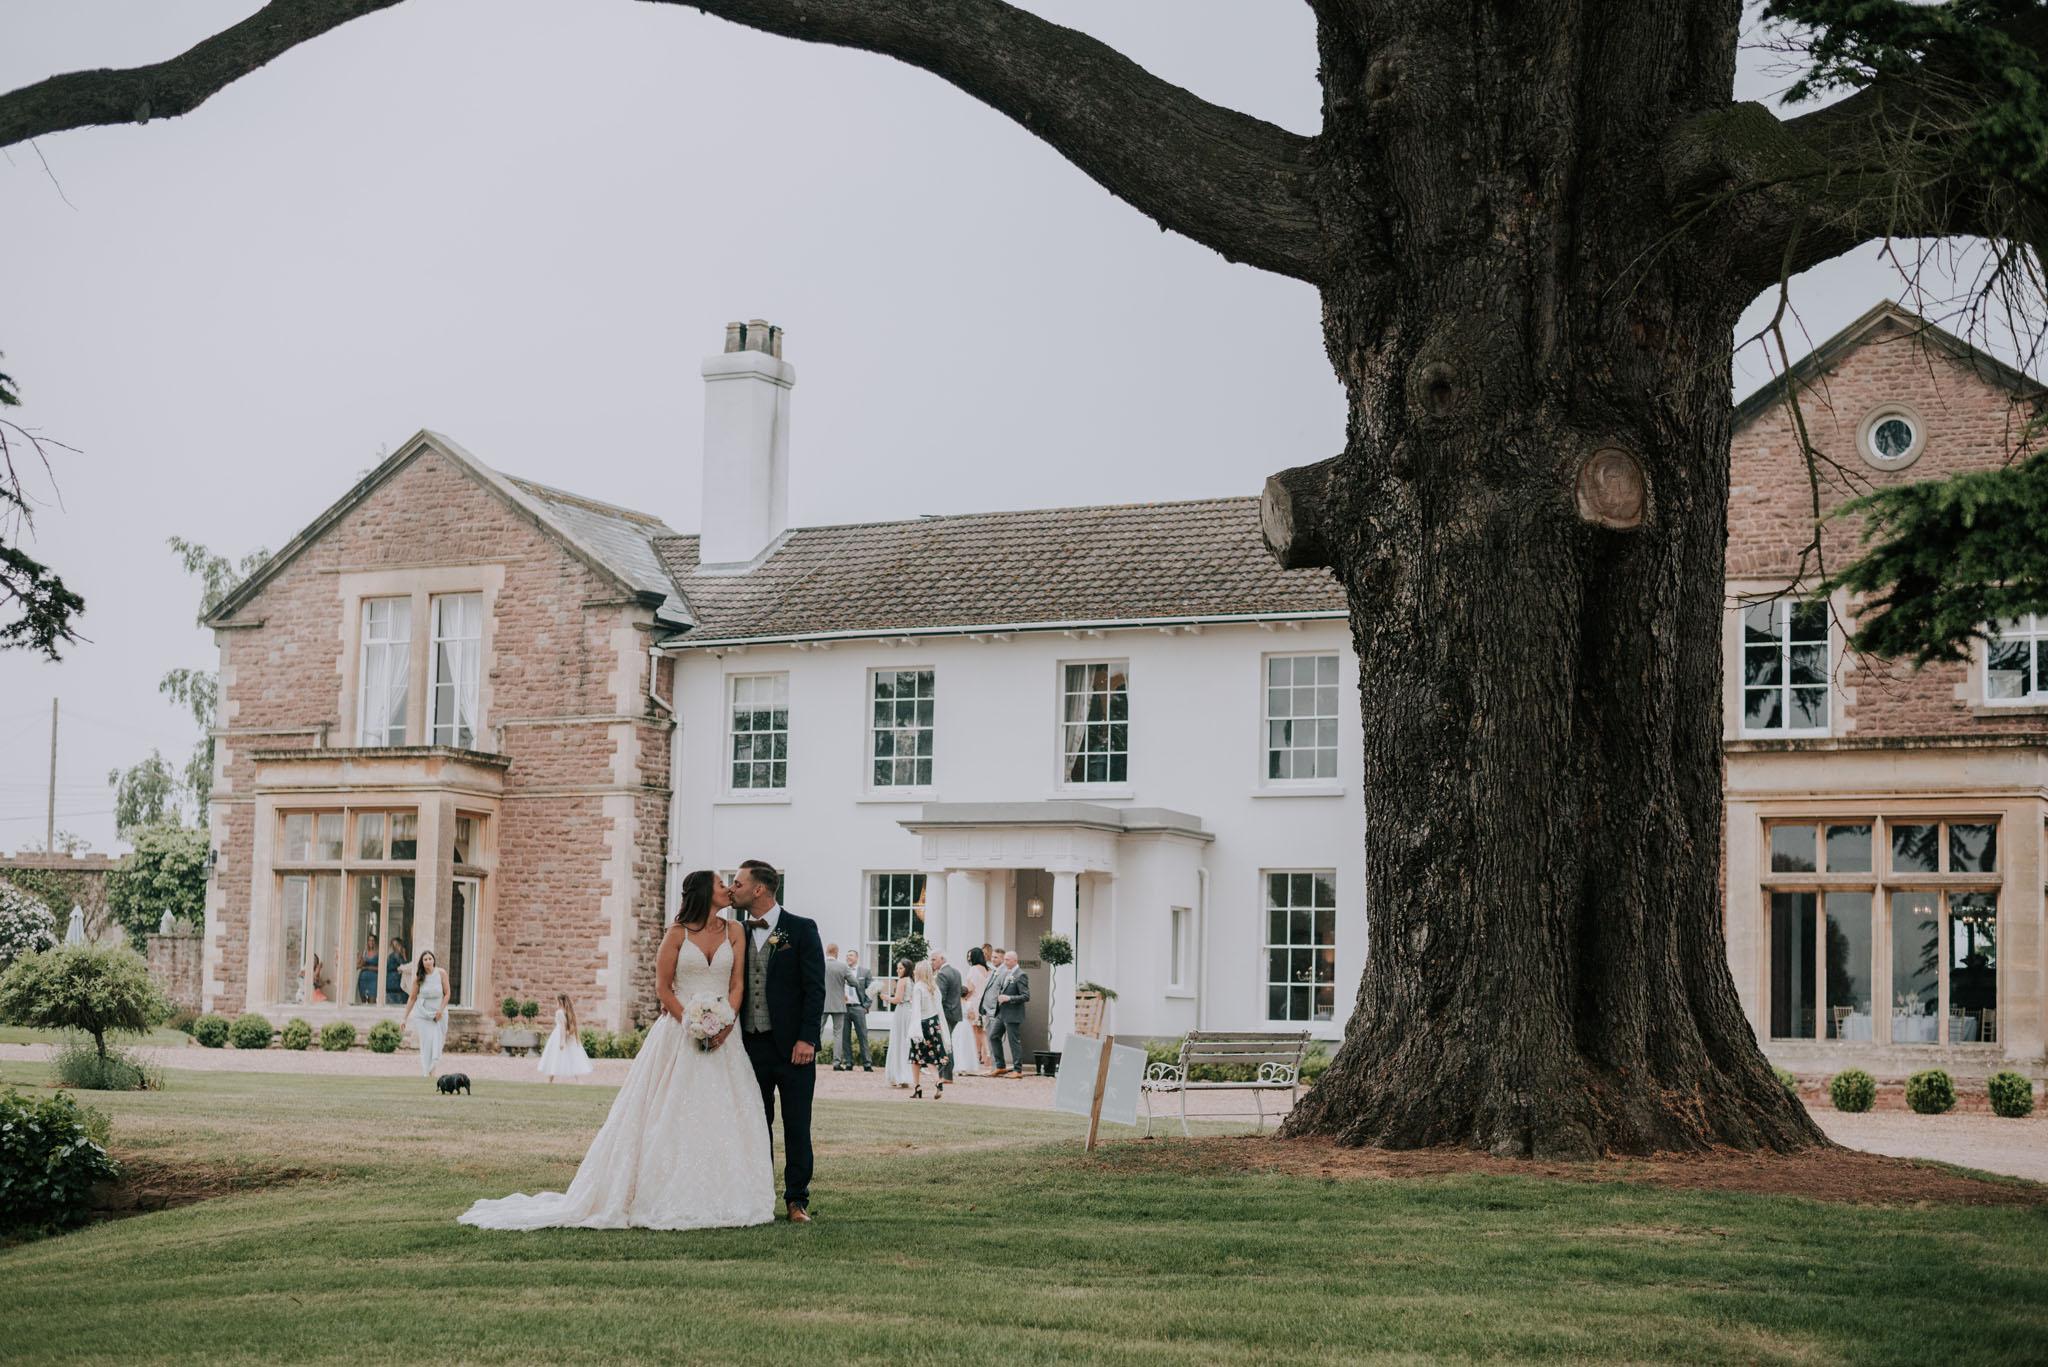 wedding-photographer-glewstone-court-hereford-scott-stockwell-photography347.jpg